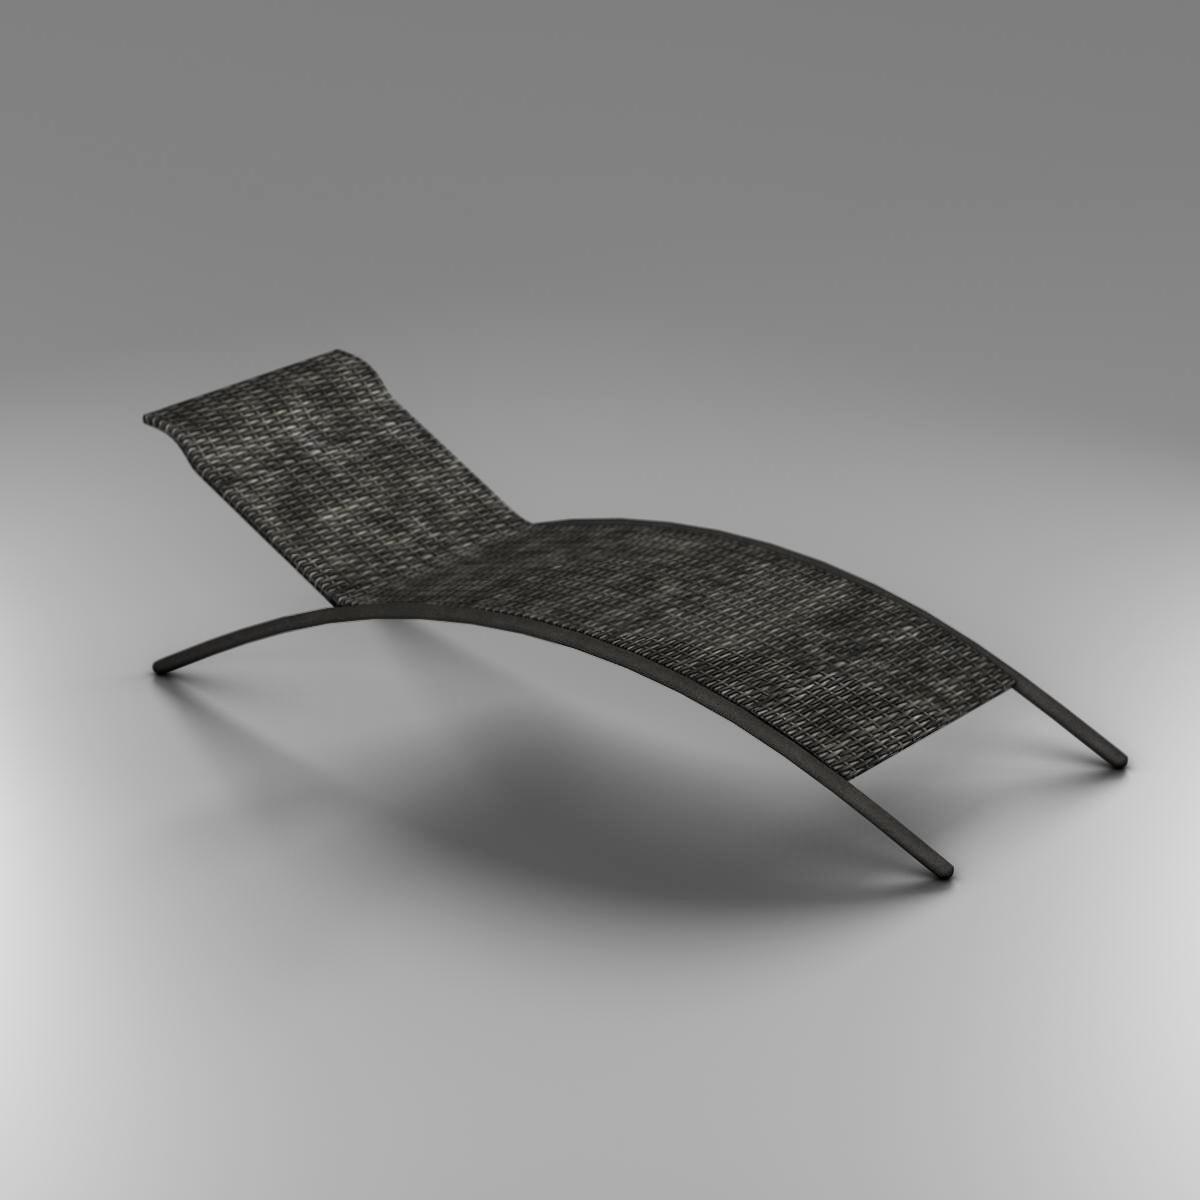 sunbed chair 3d model 3ds max fbx c4d ma mb obj 162647